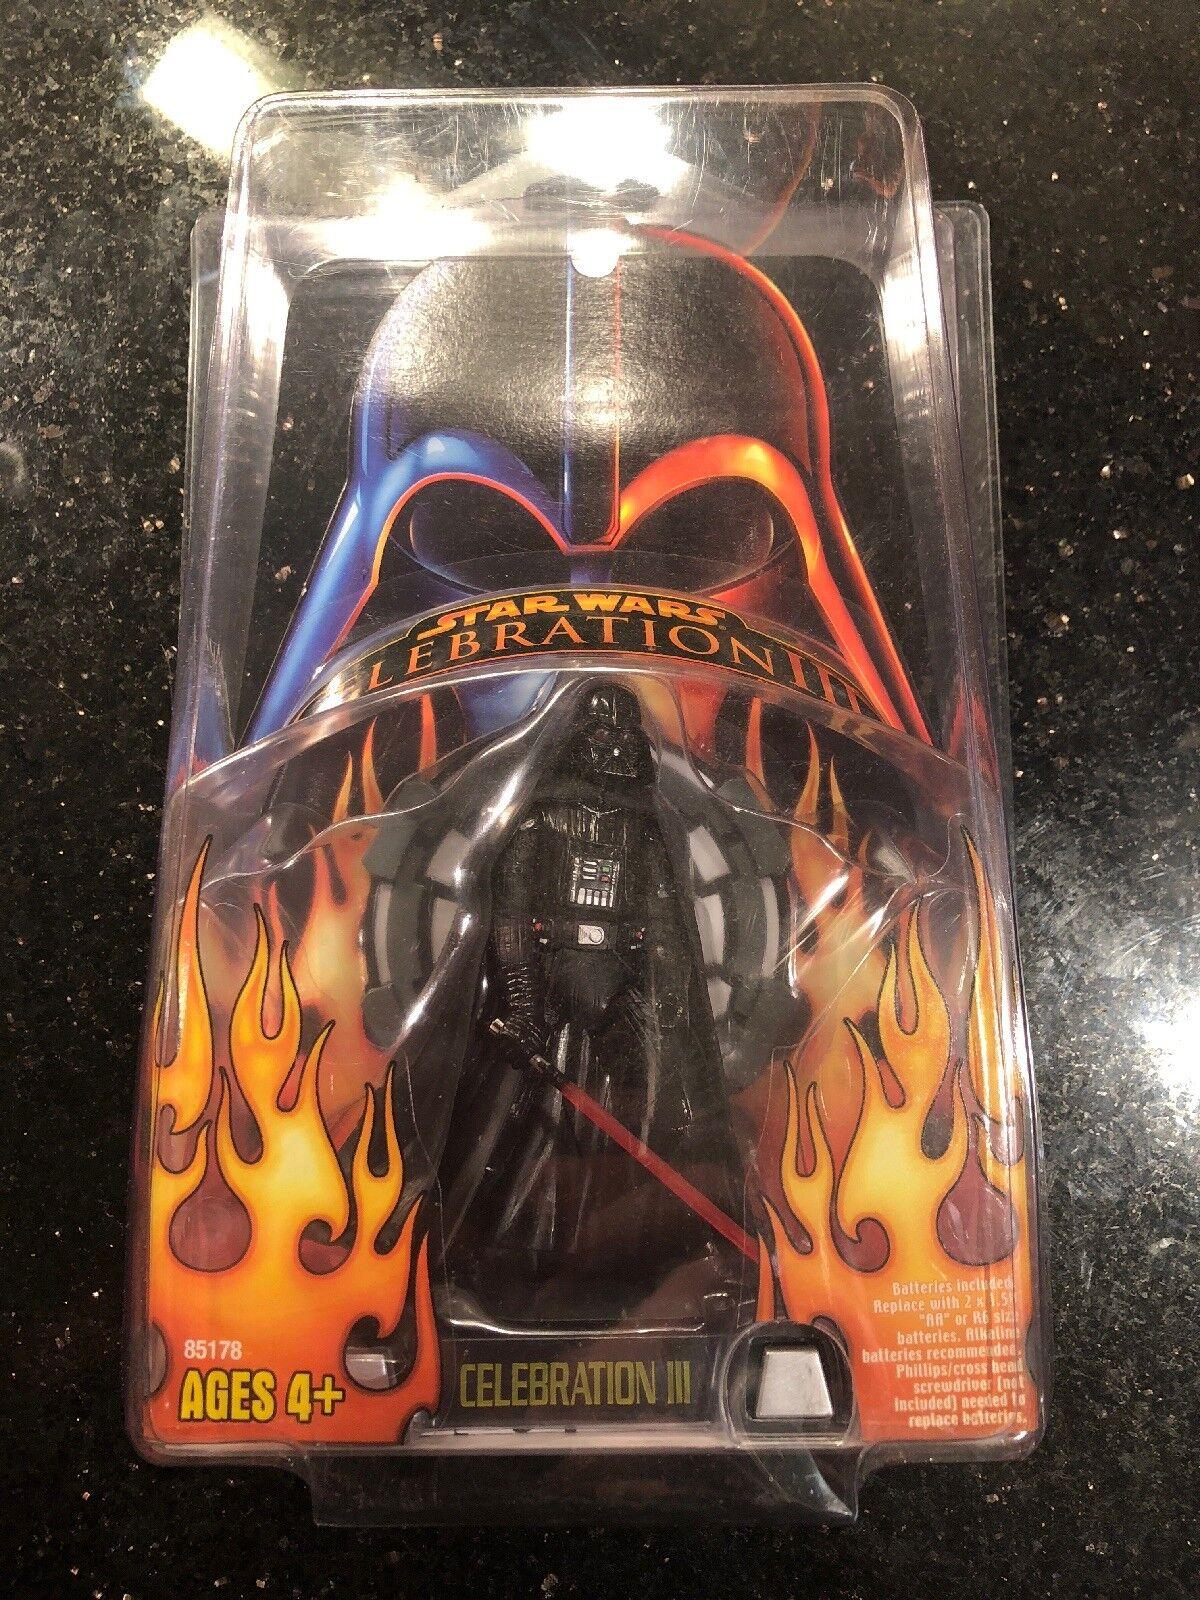 NEW Star Wars 2005 Celebration III Darth Vader Action Figure w  Hard Case